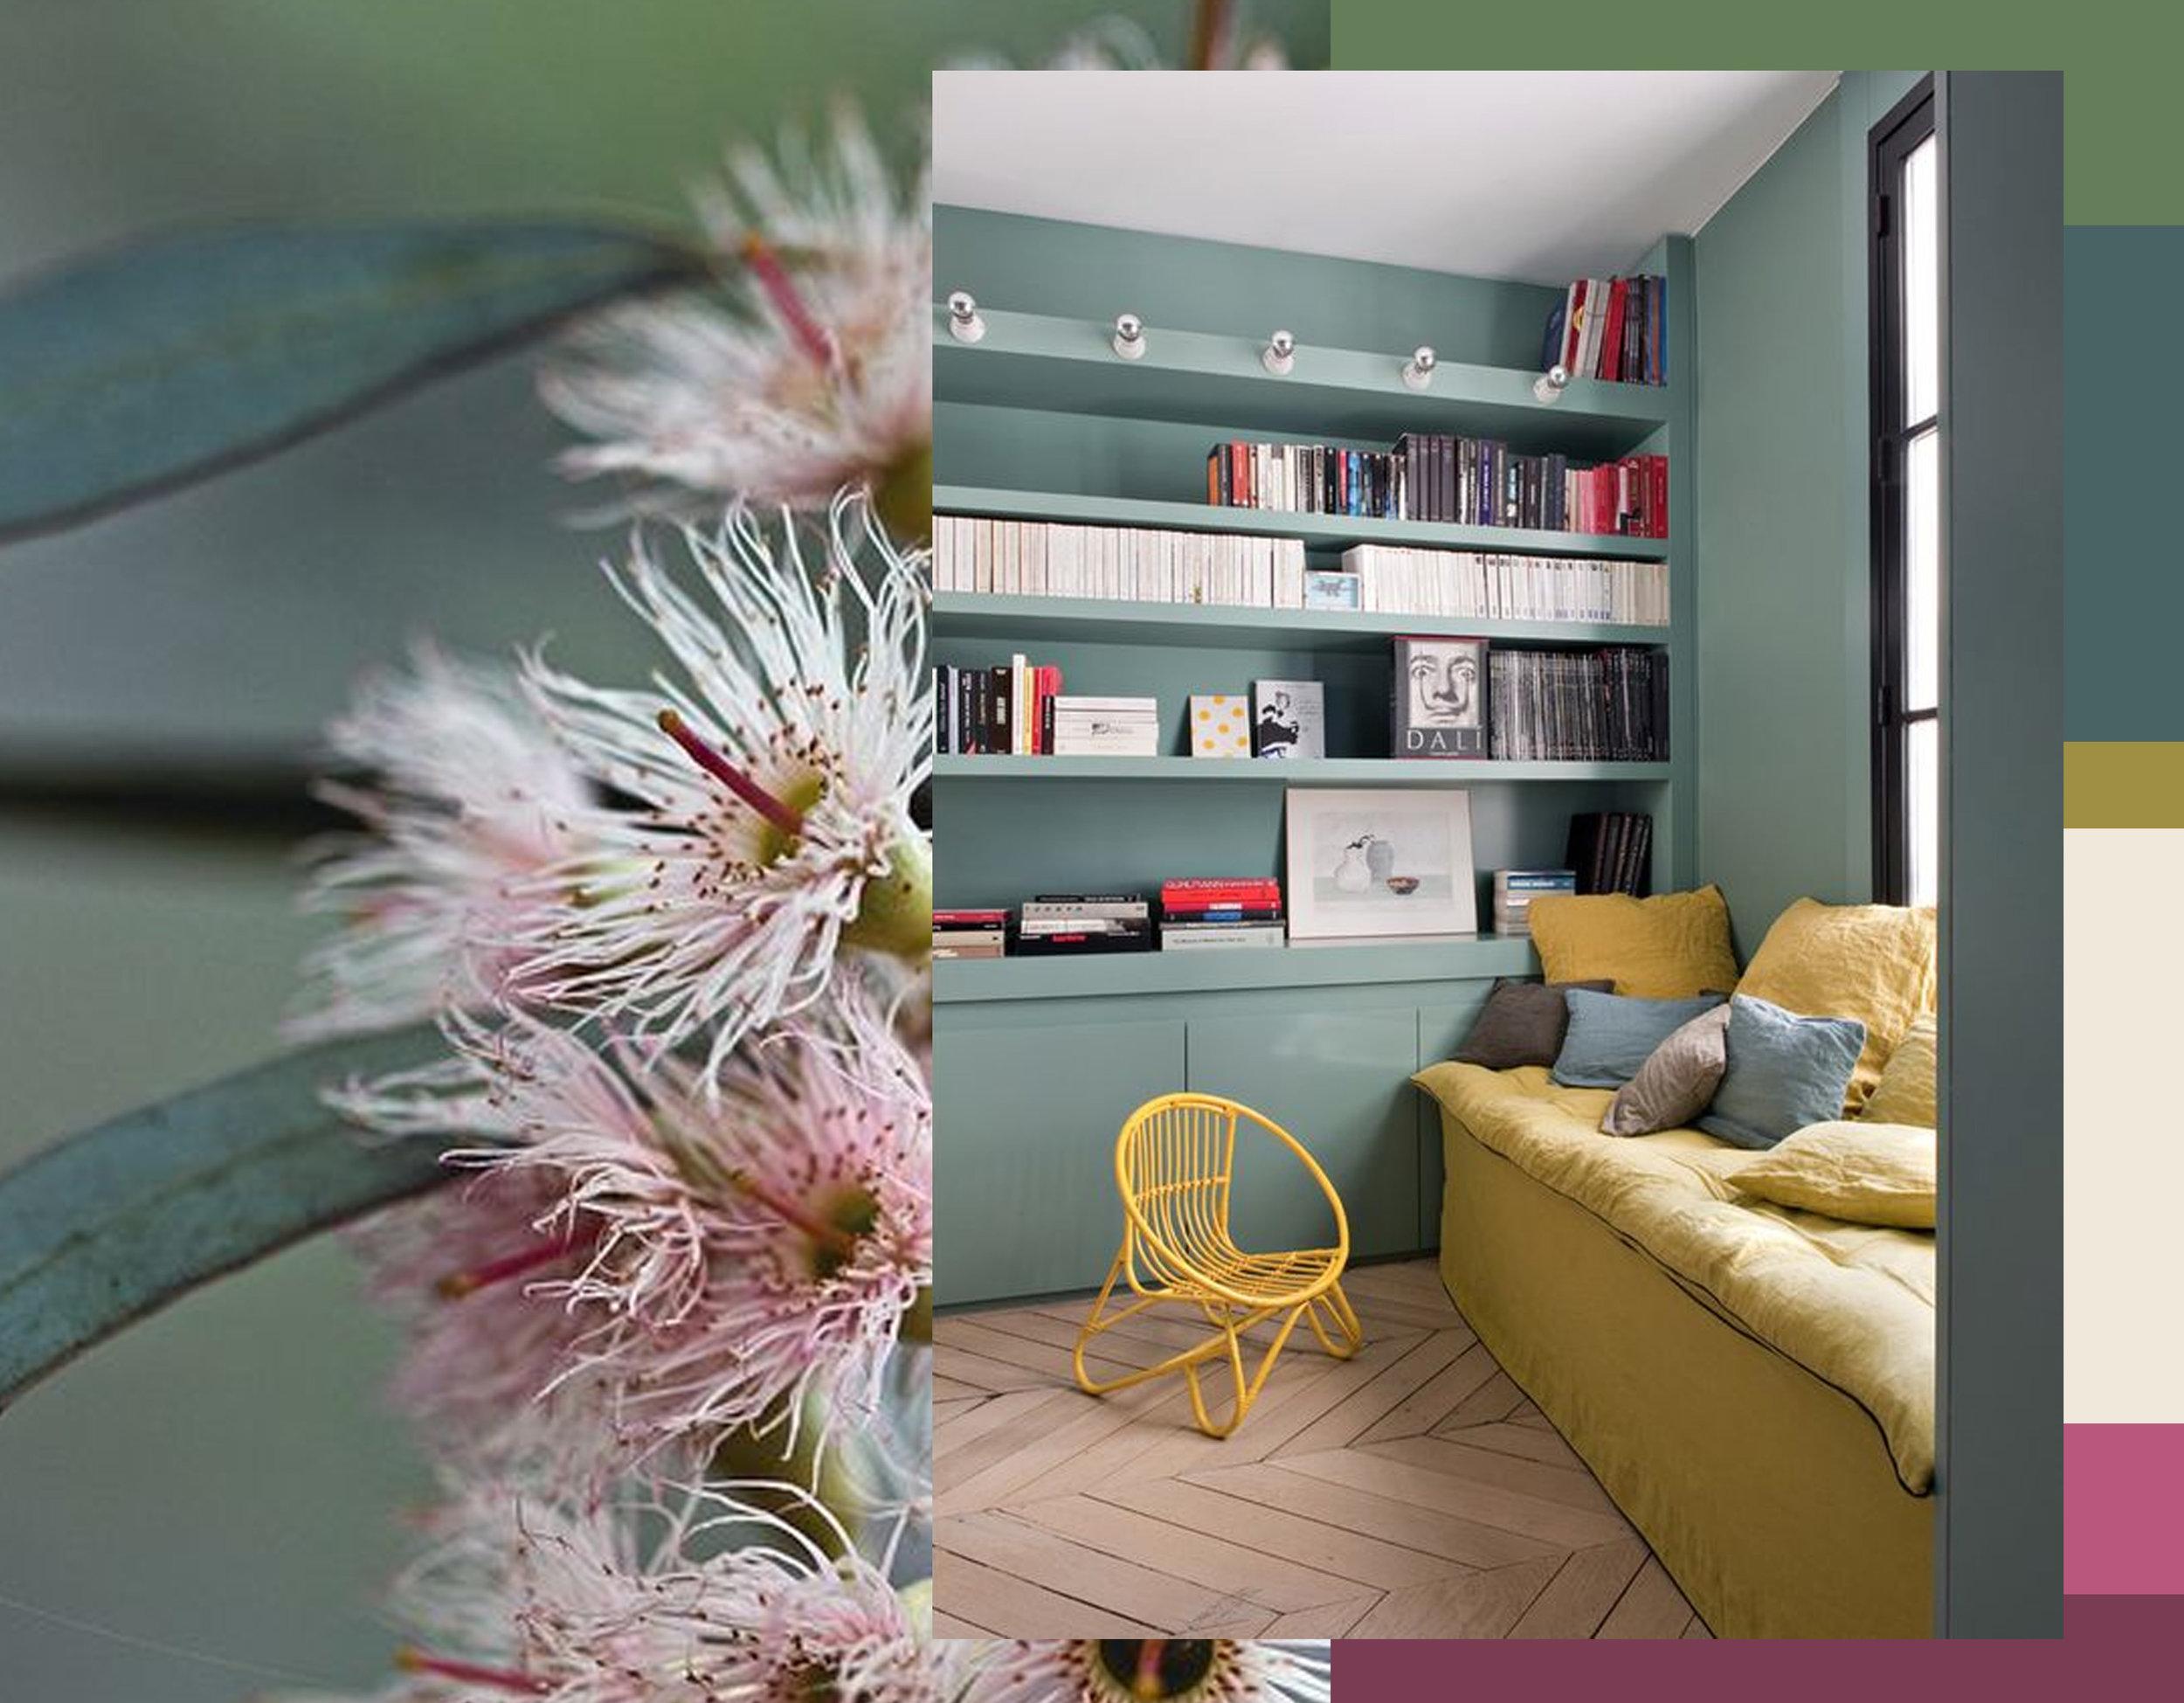 flower image via  Pinterest - interior via  My Deco Lab